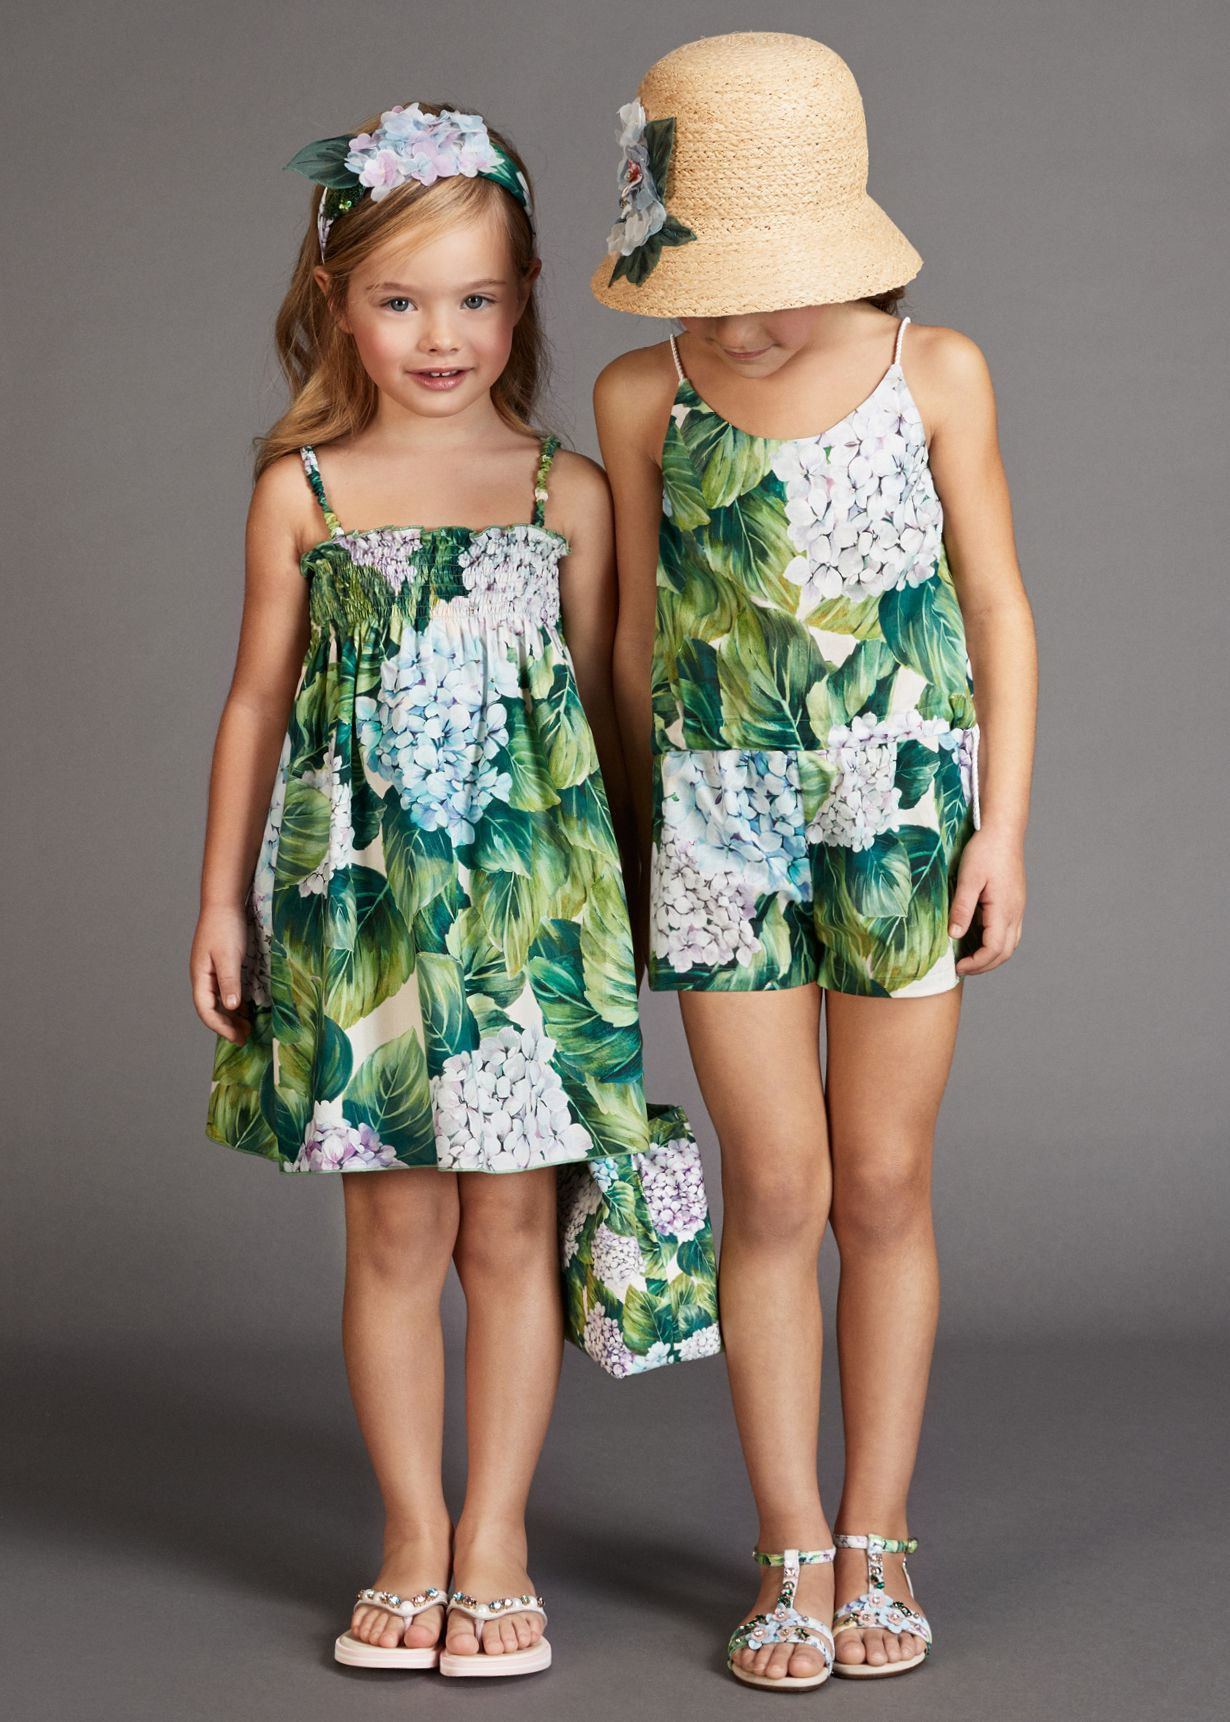 adf3a2c5 Shop Dolce & Gabbana AW17 at Childrensalon | Autumn/Winter | Dolce ...